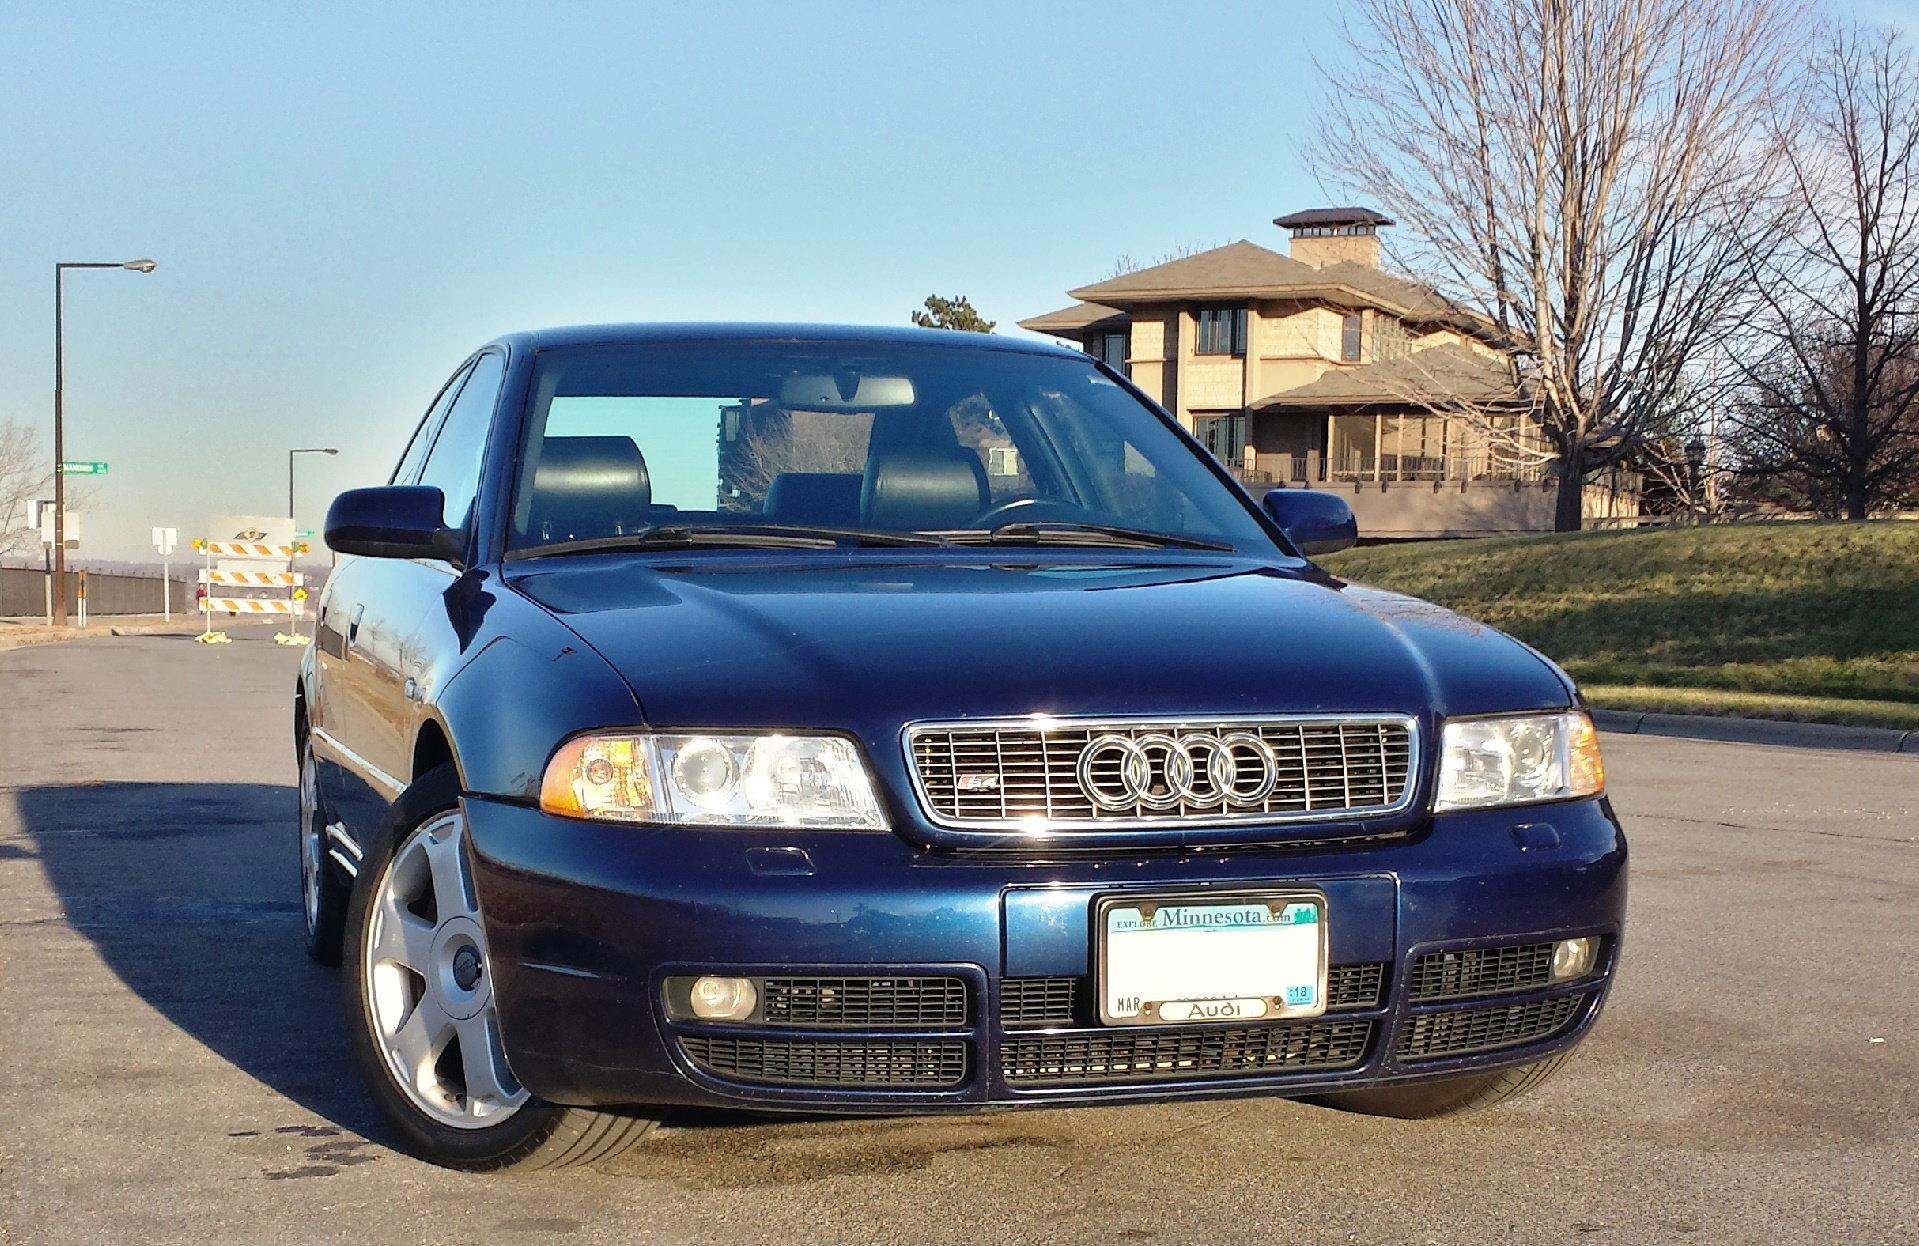 Audi Other 01 S4 - Santorin Blue - 6-Speed MT - St. Paul ...